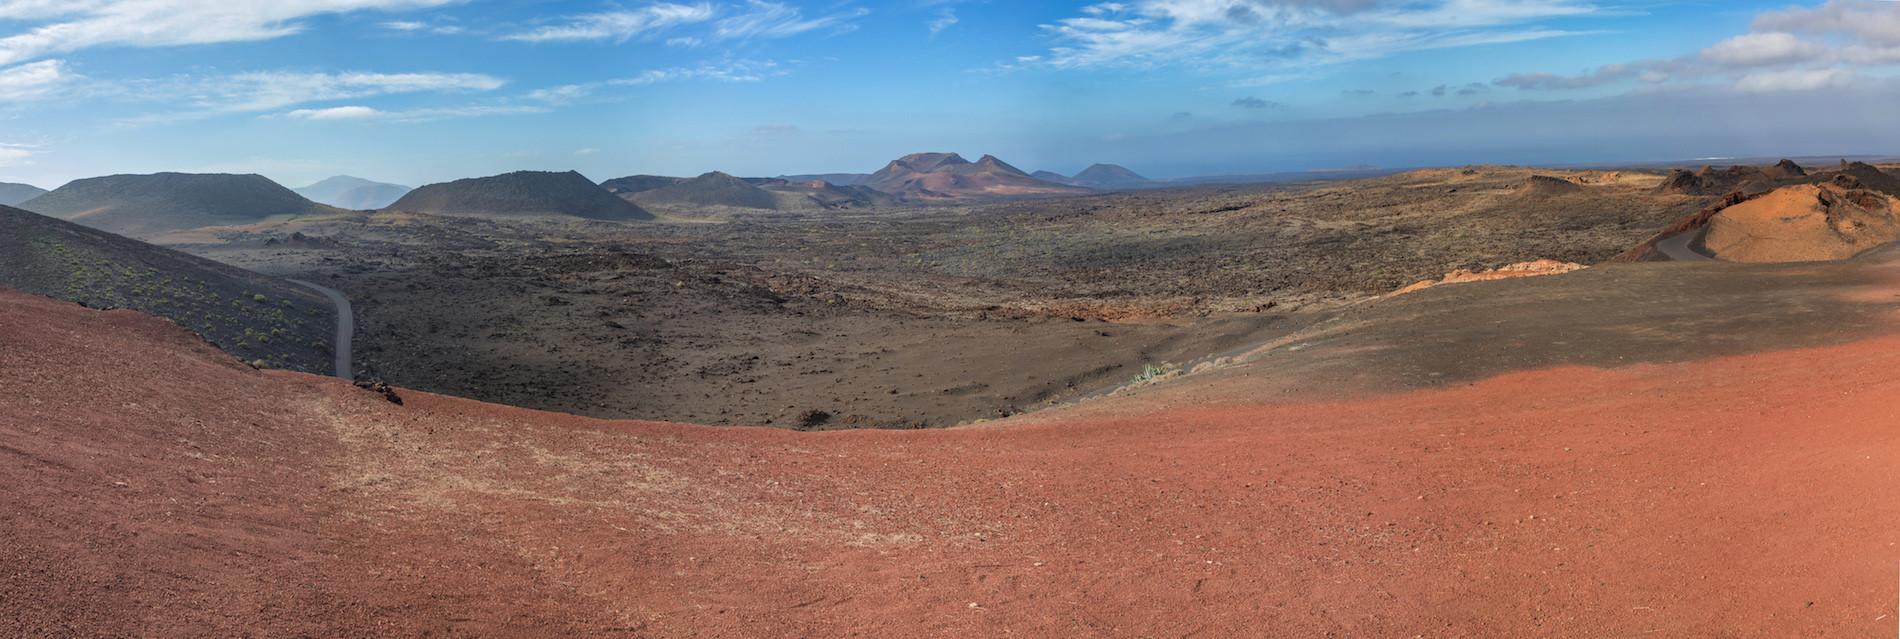 PHOTO Lanzarote Parc Timanfaya panoramique